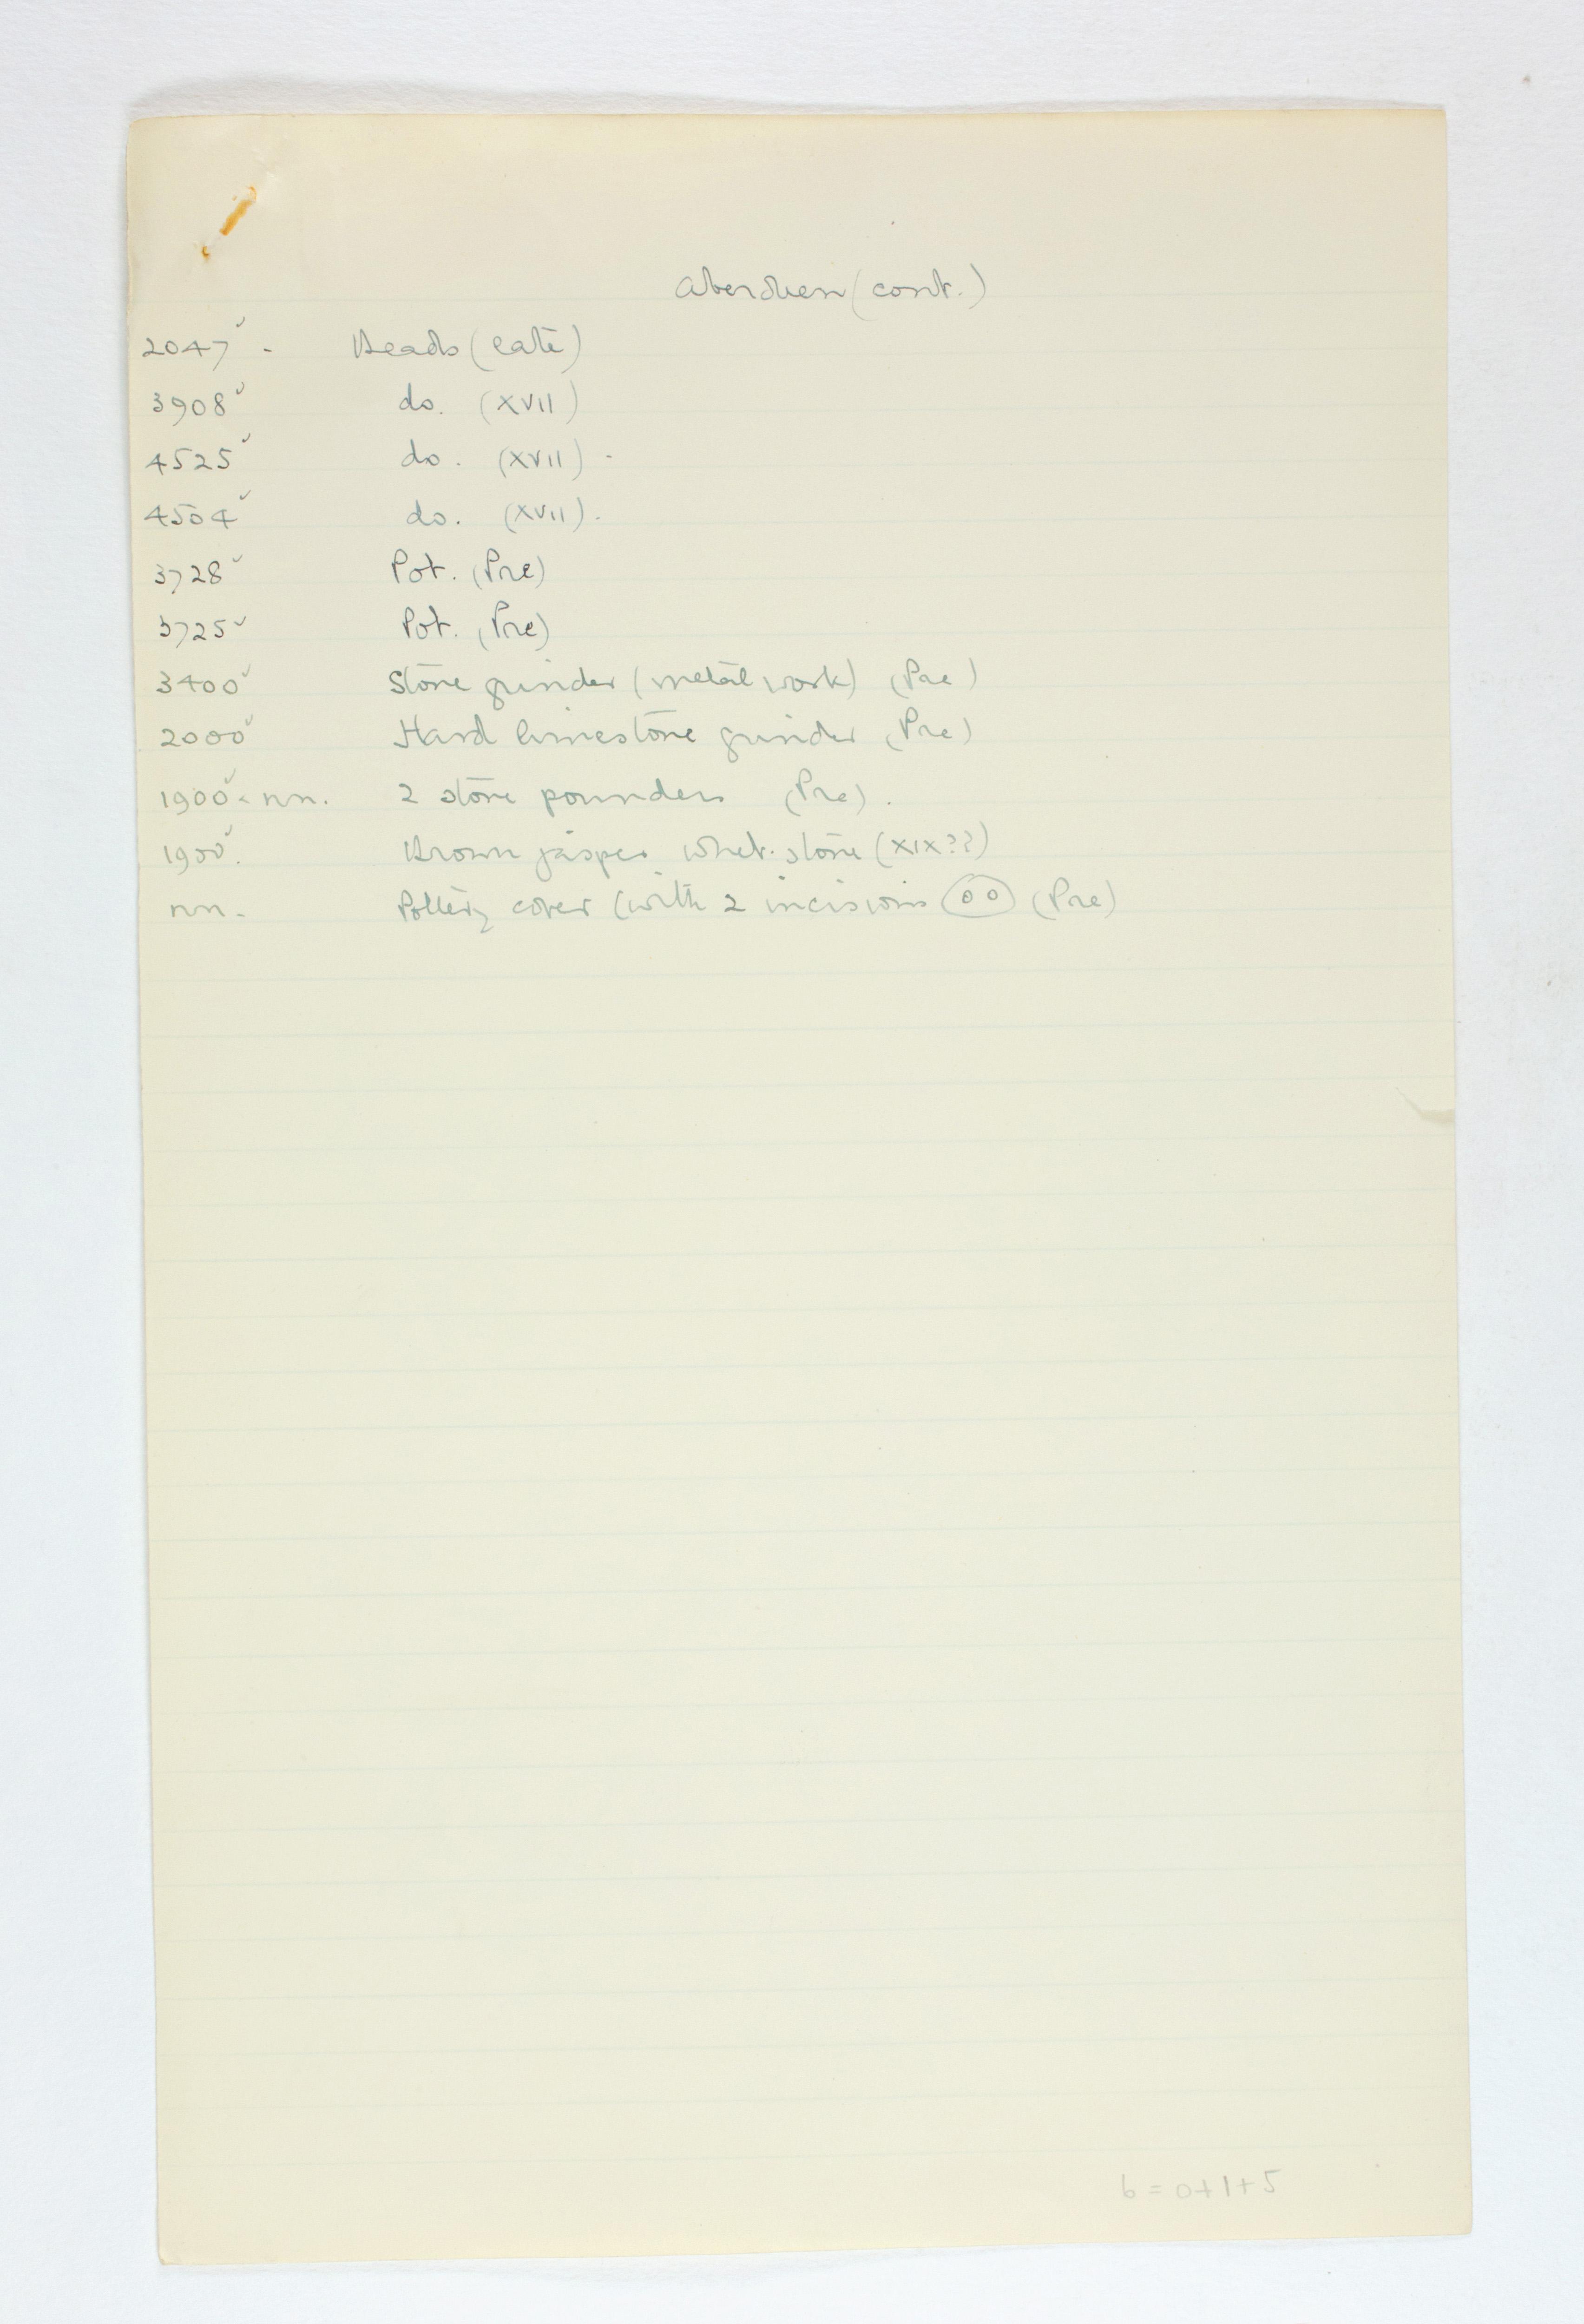 1923-24 Qau el-Kebir, Hemamieh Individual institution list PMA/WFP1/D/27/2.2